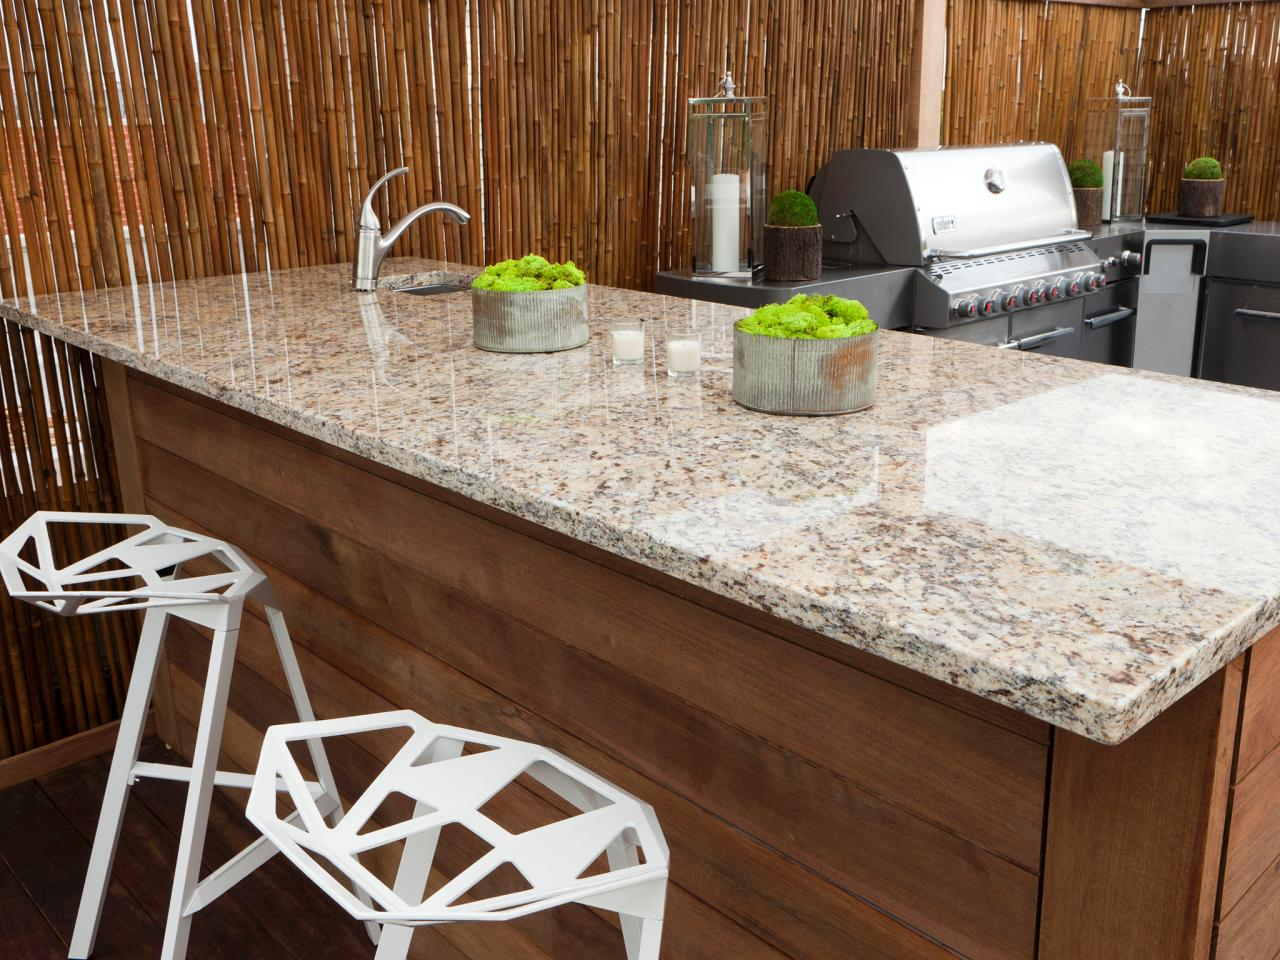 9 Material Top Table Kitchen Set, Mana Pilihanmu   sarae.id